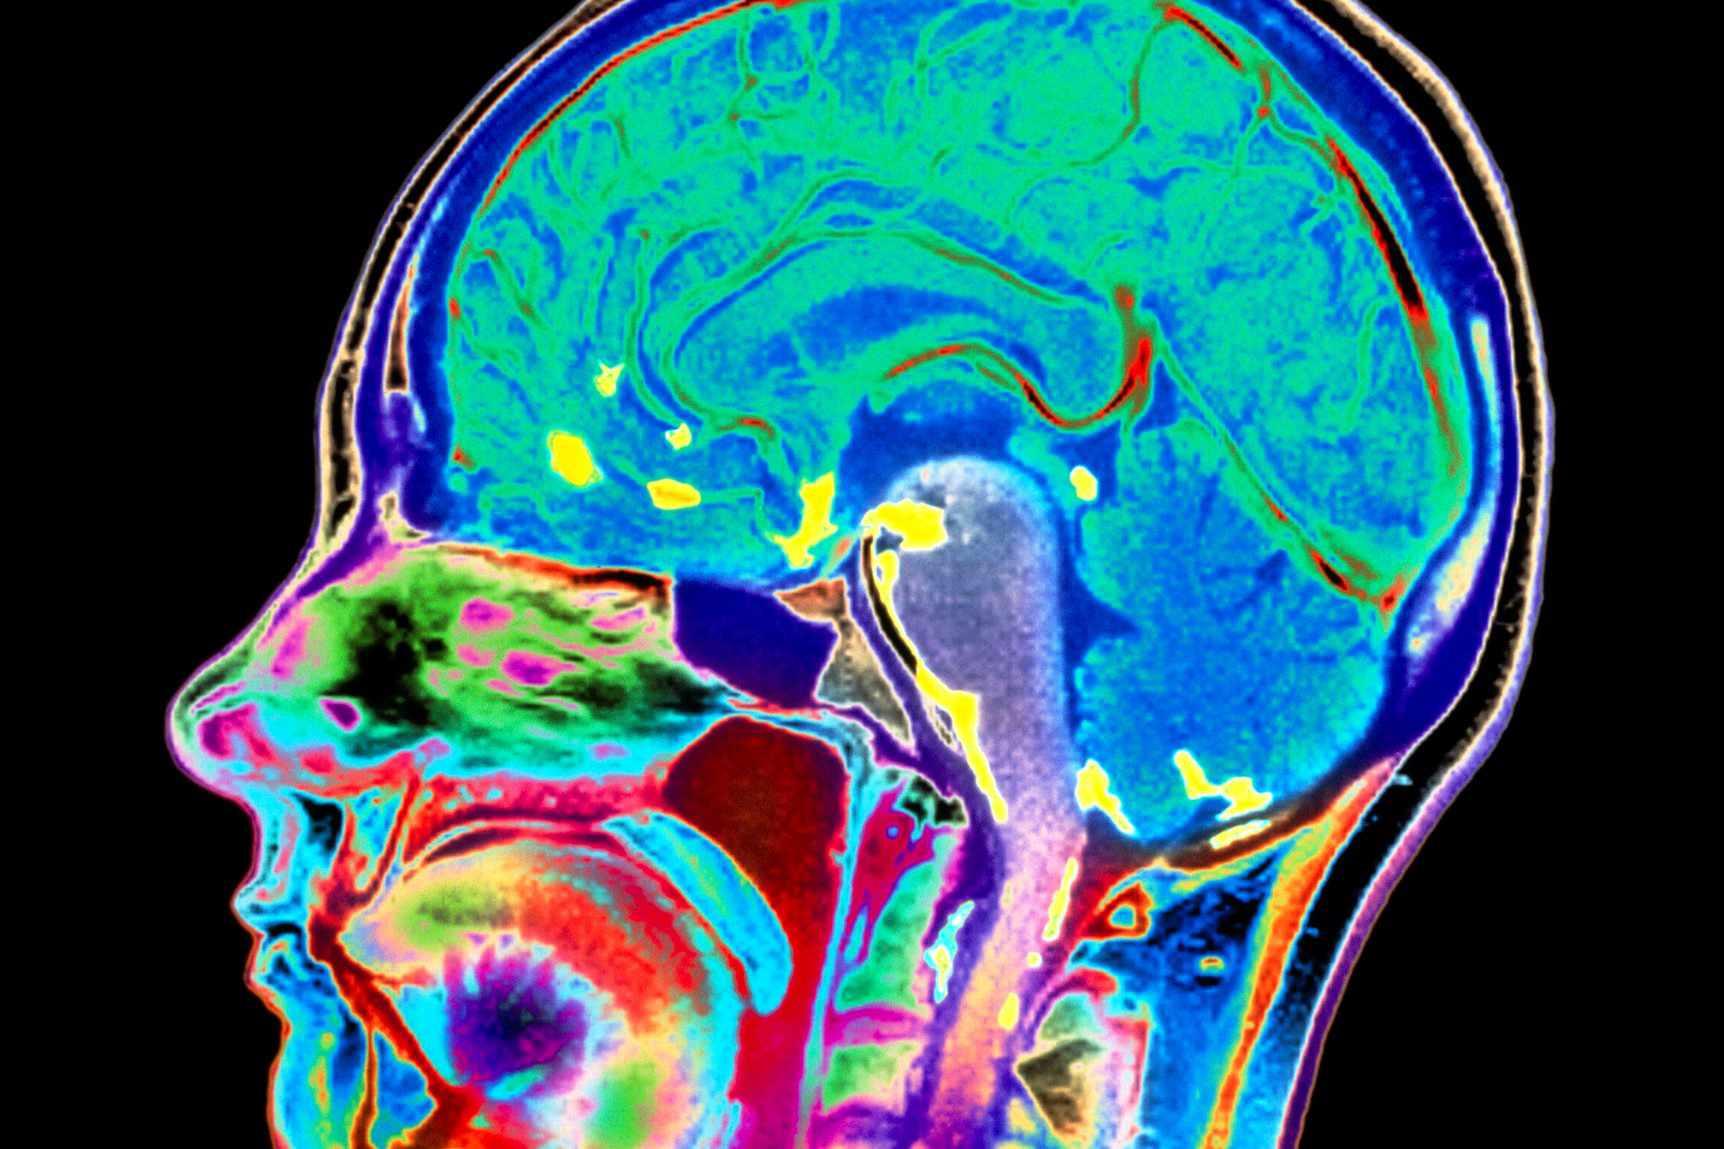 Brain scan of a patient with meningitis